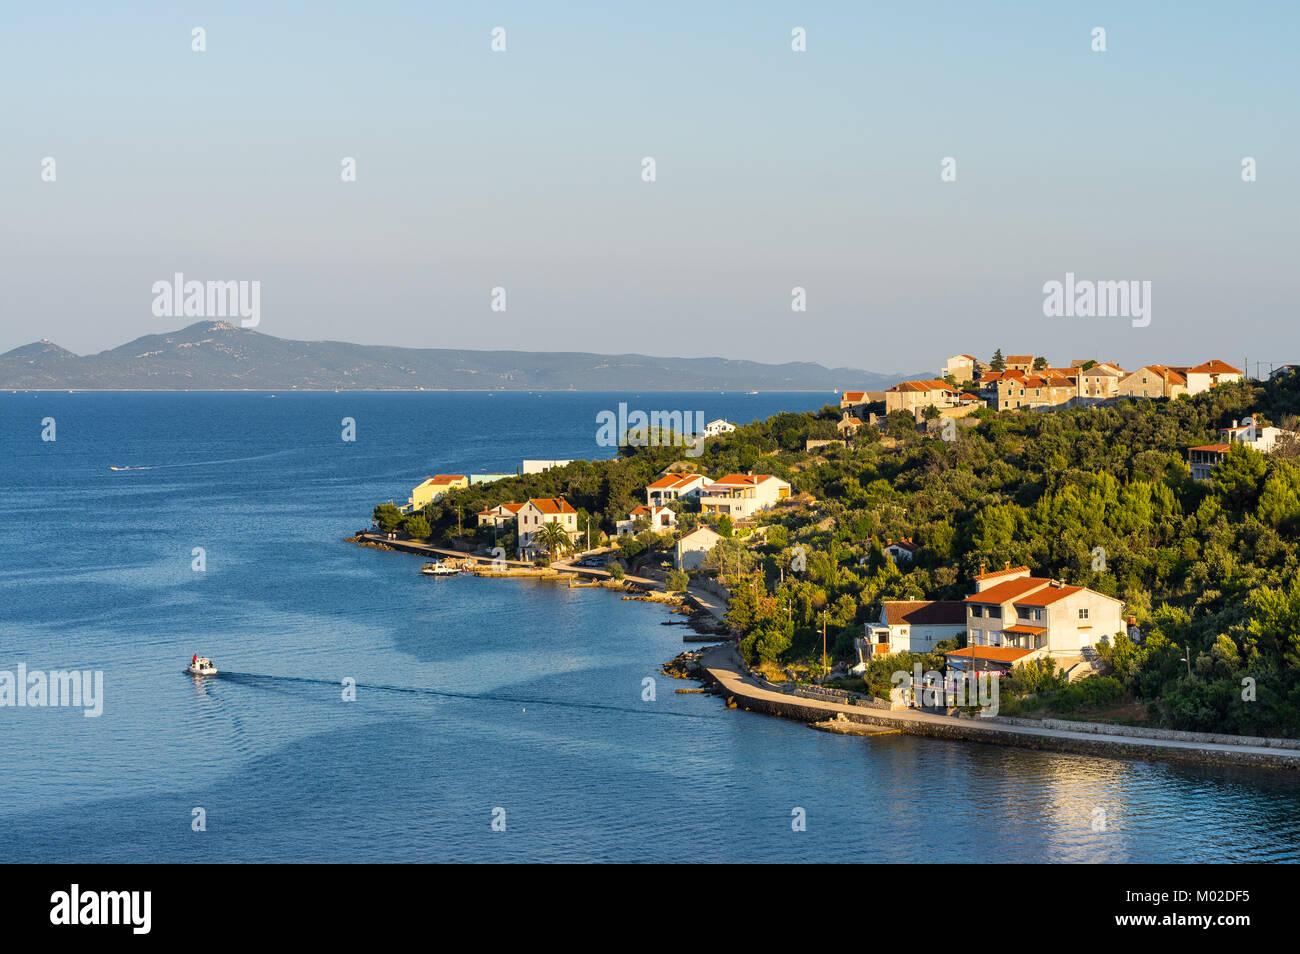 Verano en la isla de iz, Croacia Imagen De Stock